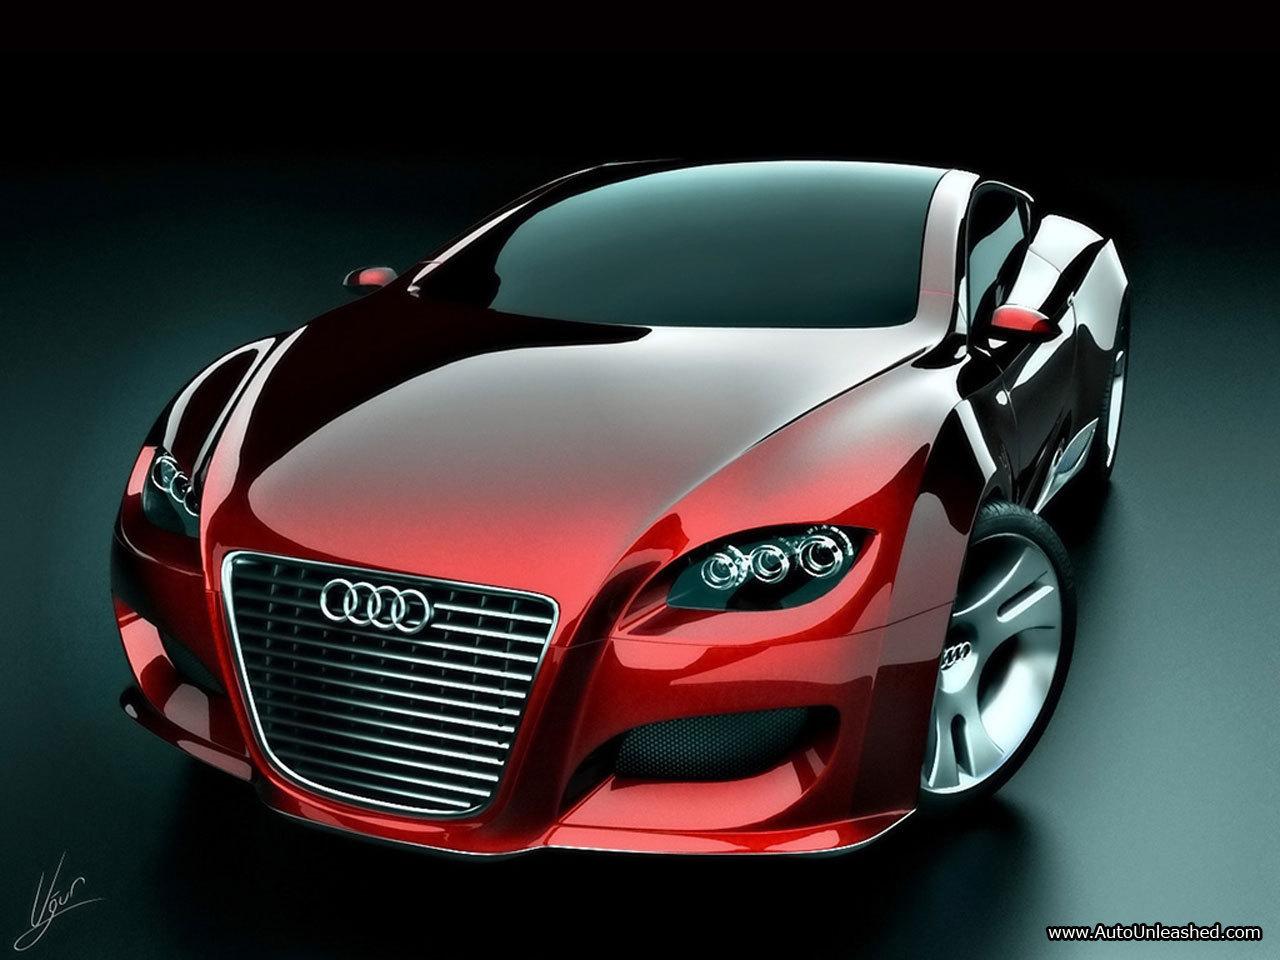 Audi Cars Wallpapers Popular Automotive - Audi car 1000cc